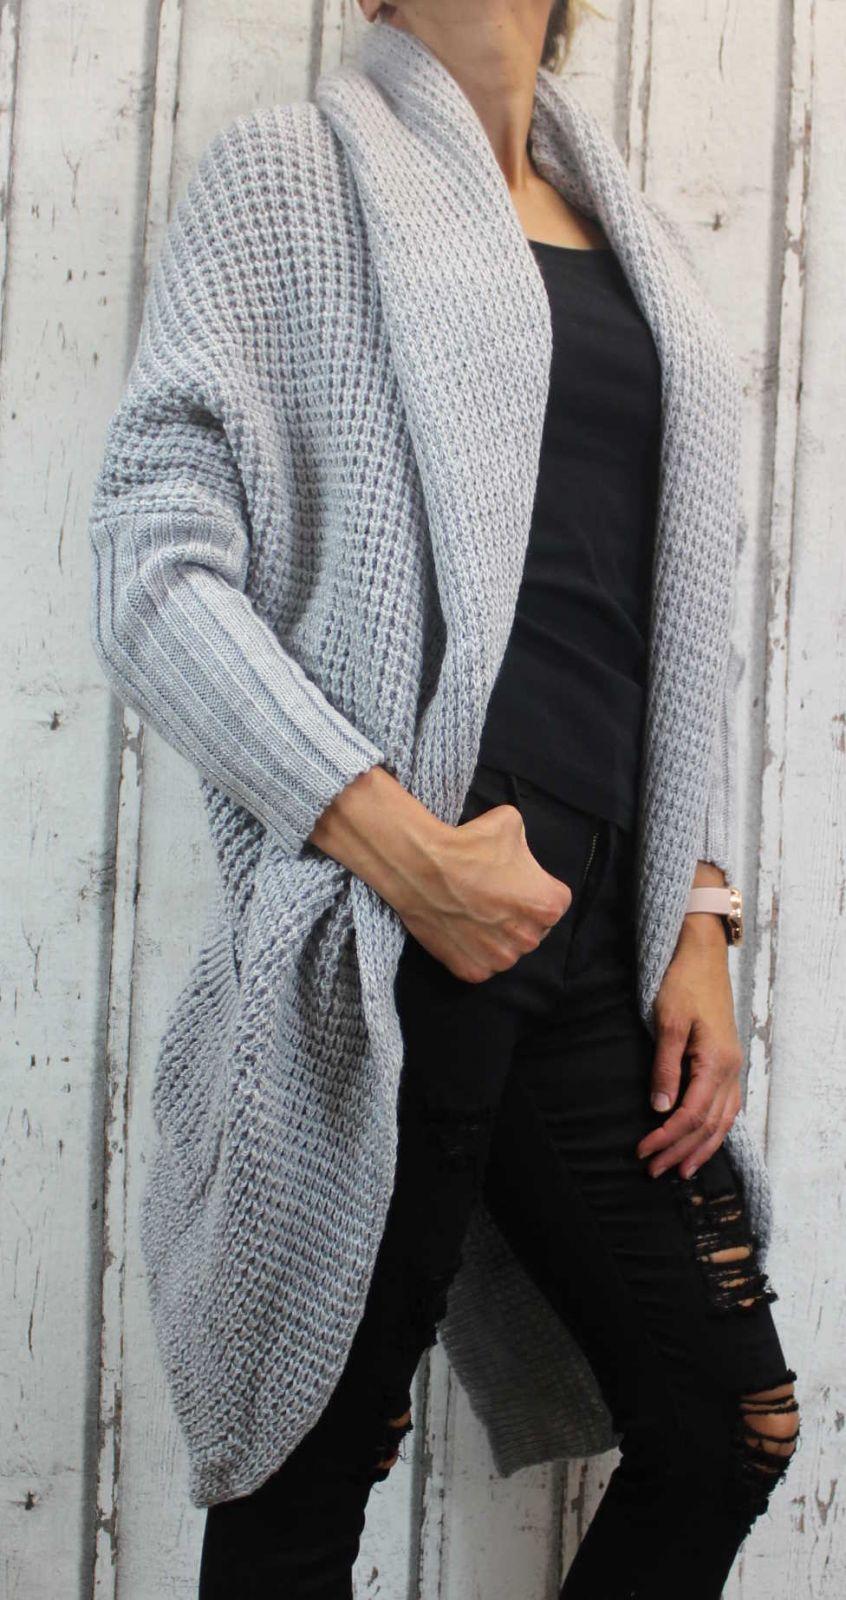 Dámský dlouhý pletený kardigan dámský dlouhý svetr Italy Moda